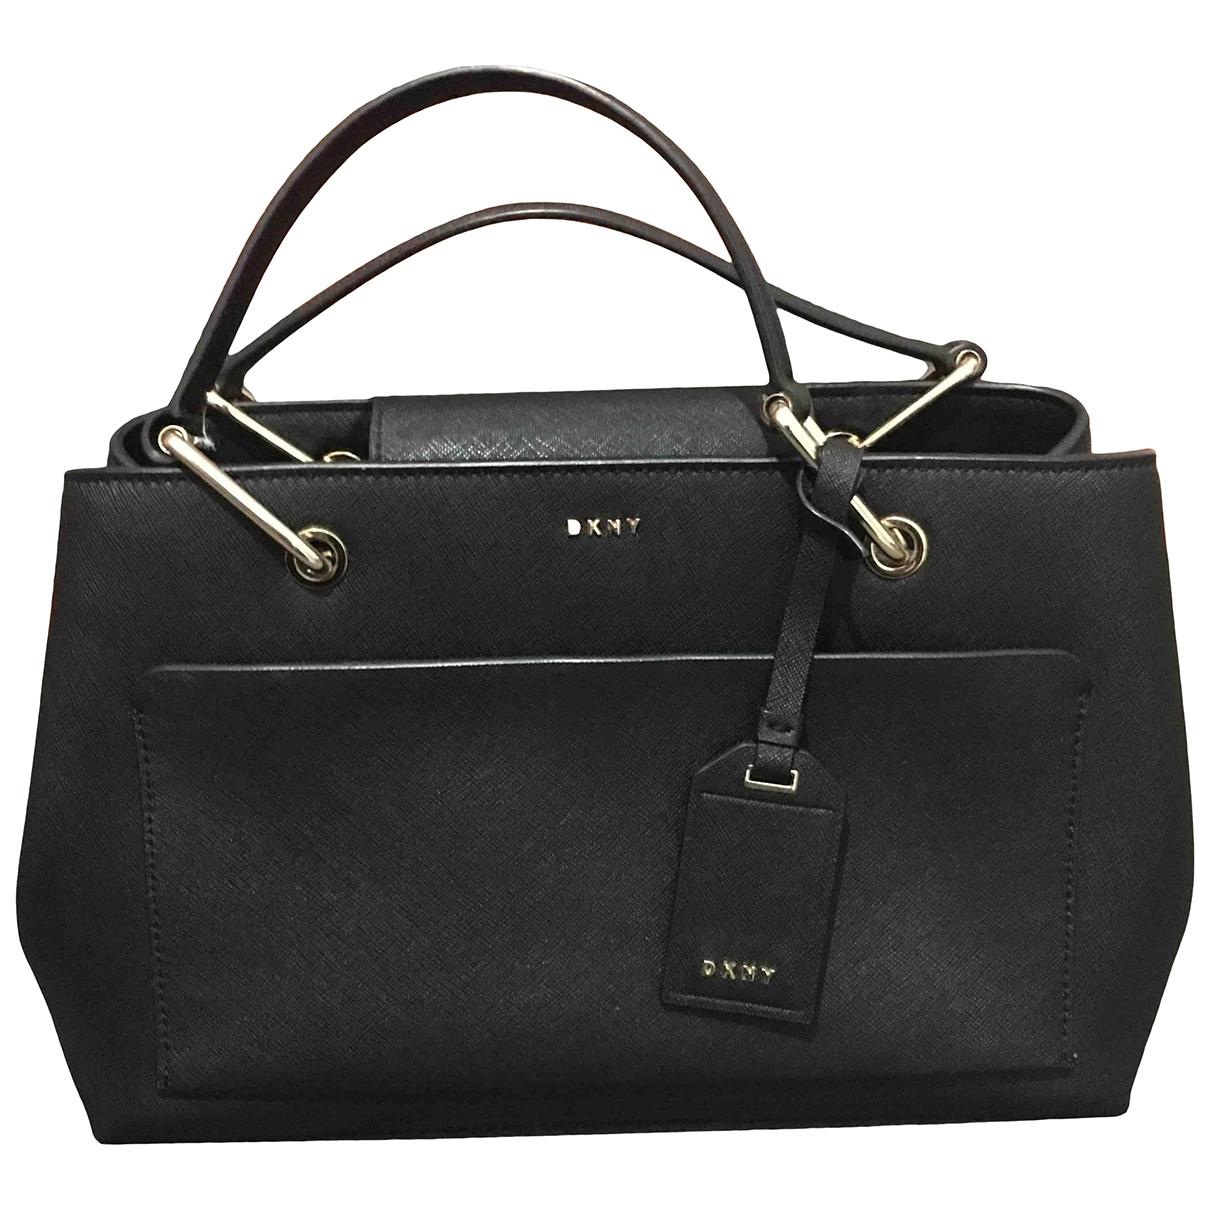 Dkny \N Black Patent leather handbag for Women \N